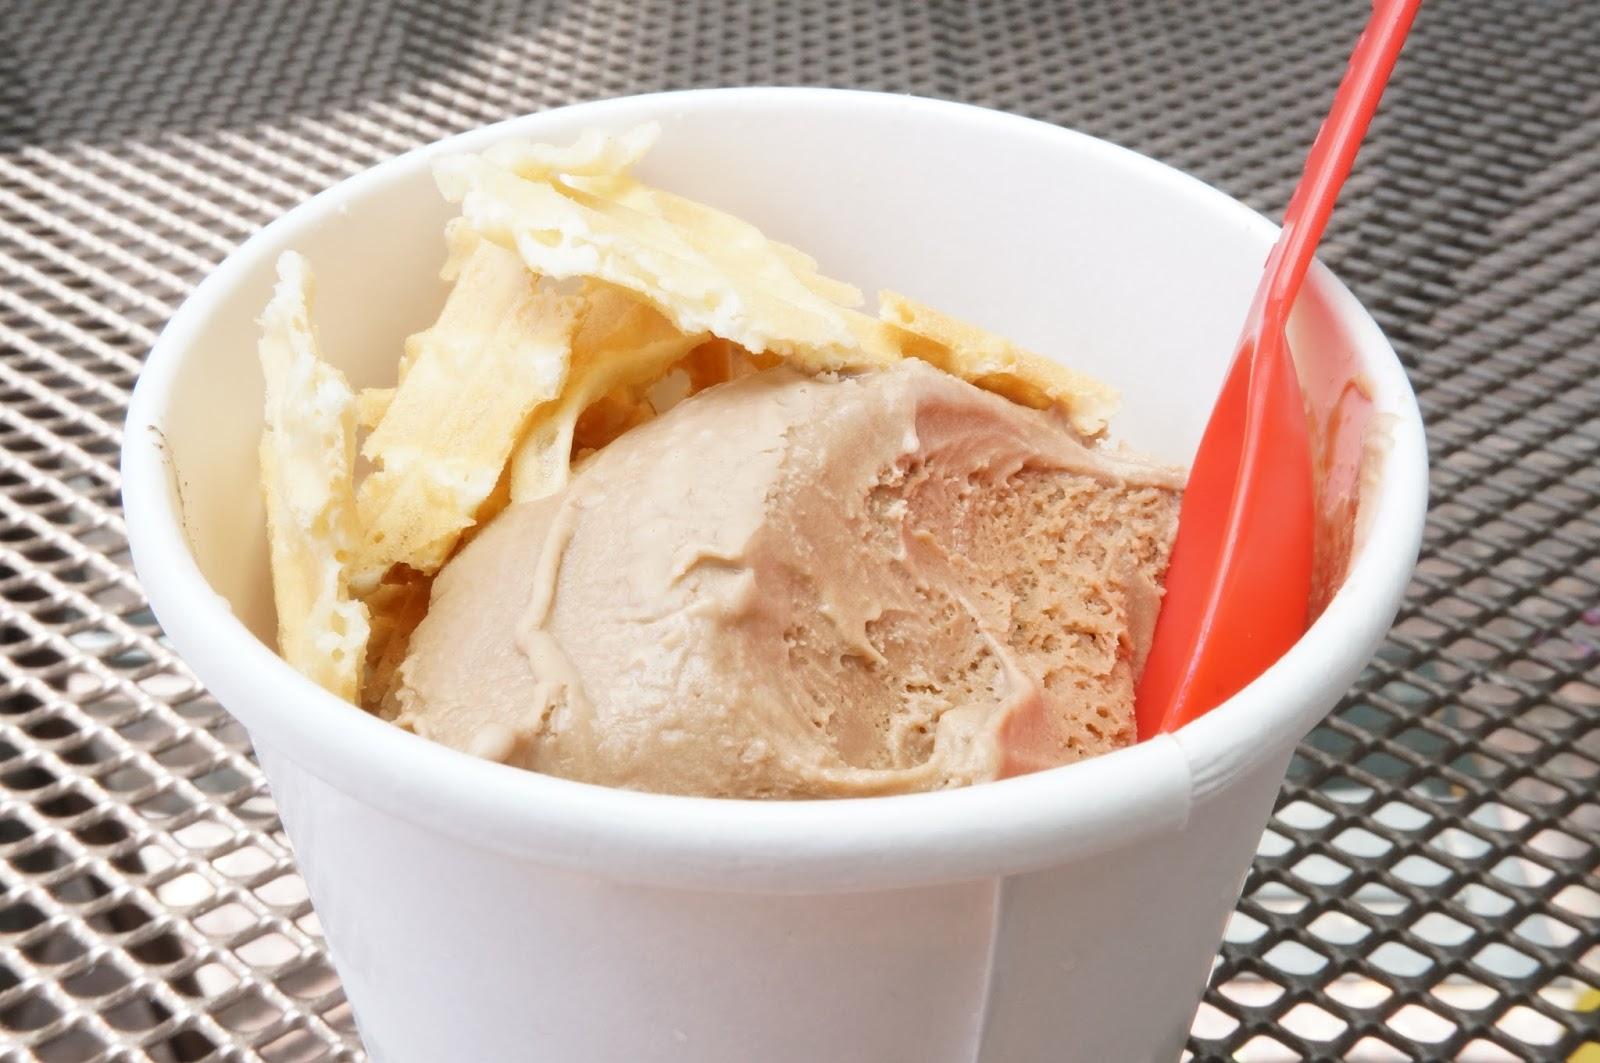 Milkbox Ice Creamery at Union Station Denver